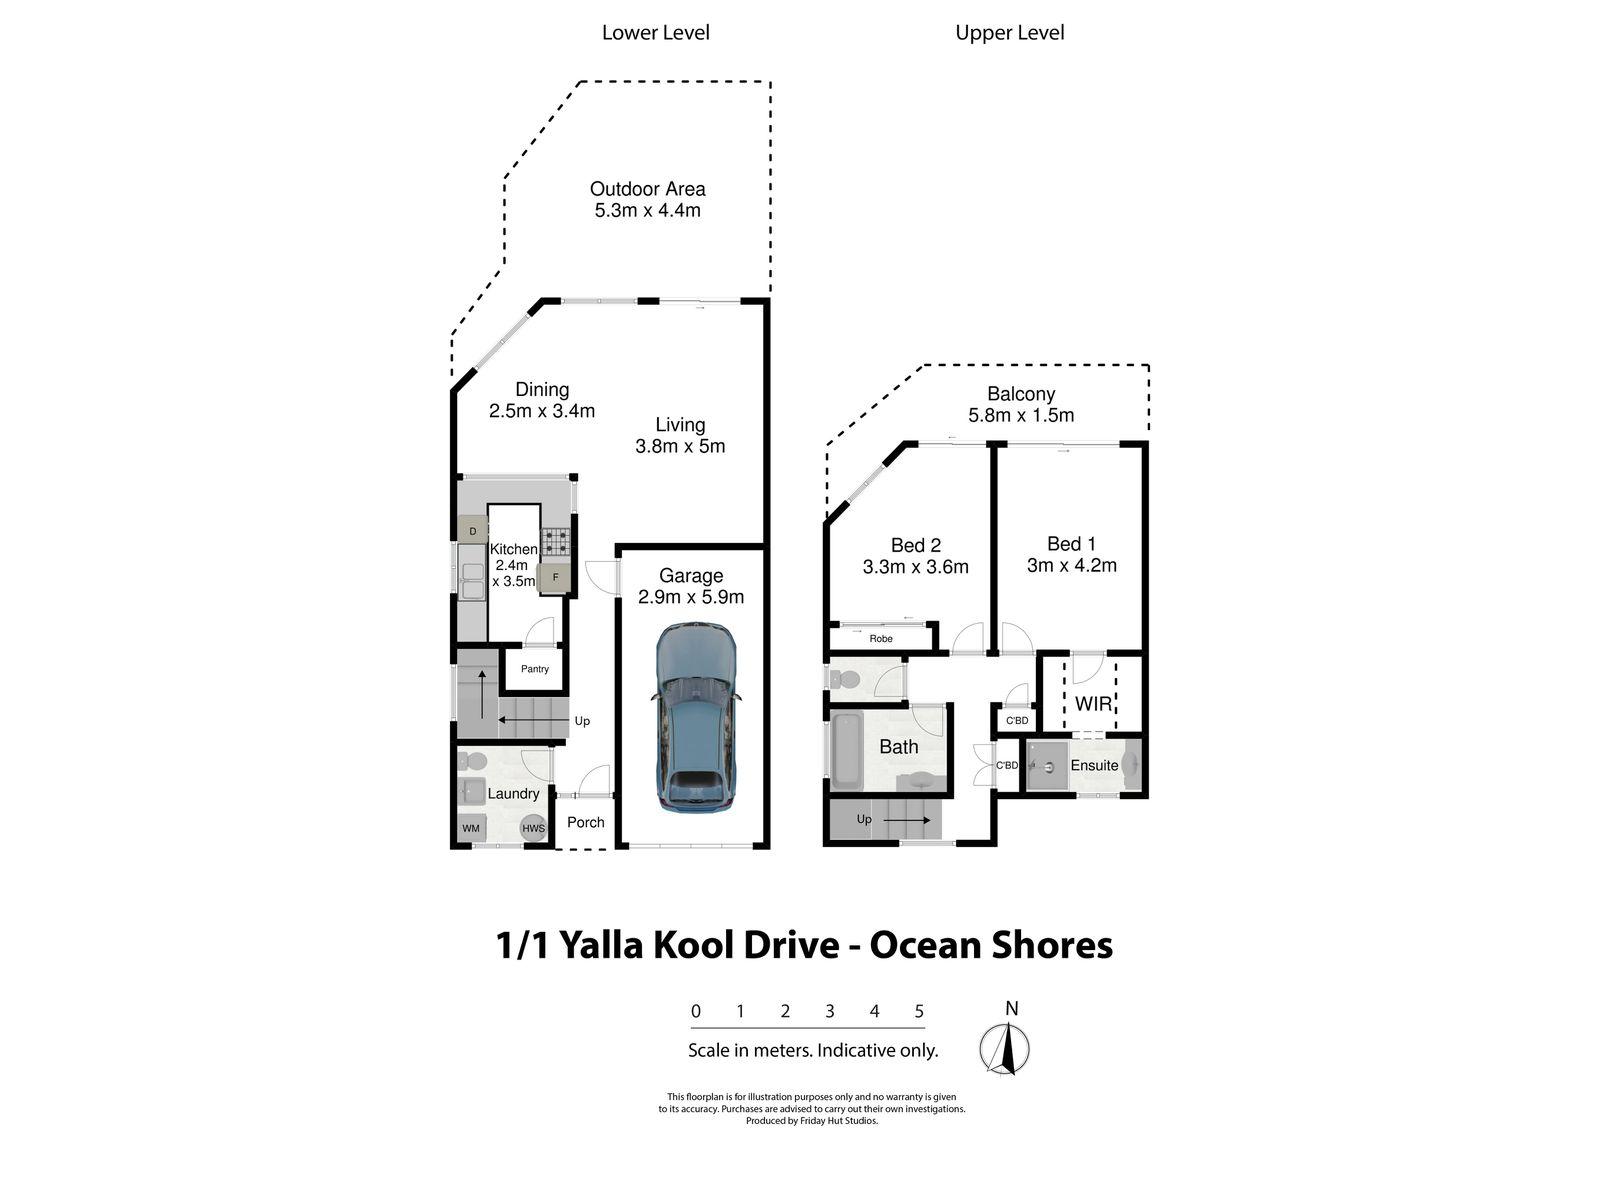 1 / 1 Yalla Kool Drive, Ocean Shores